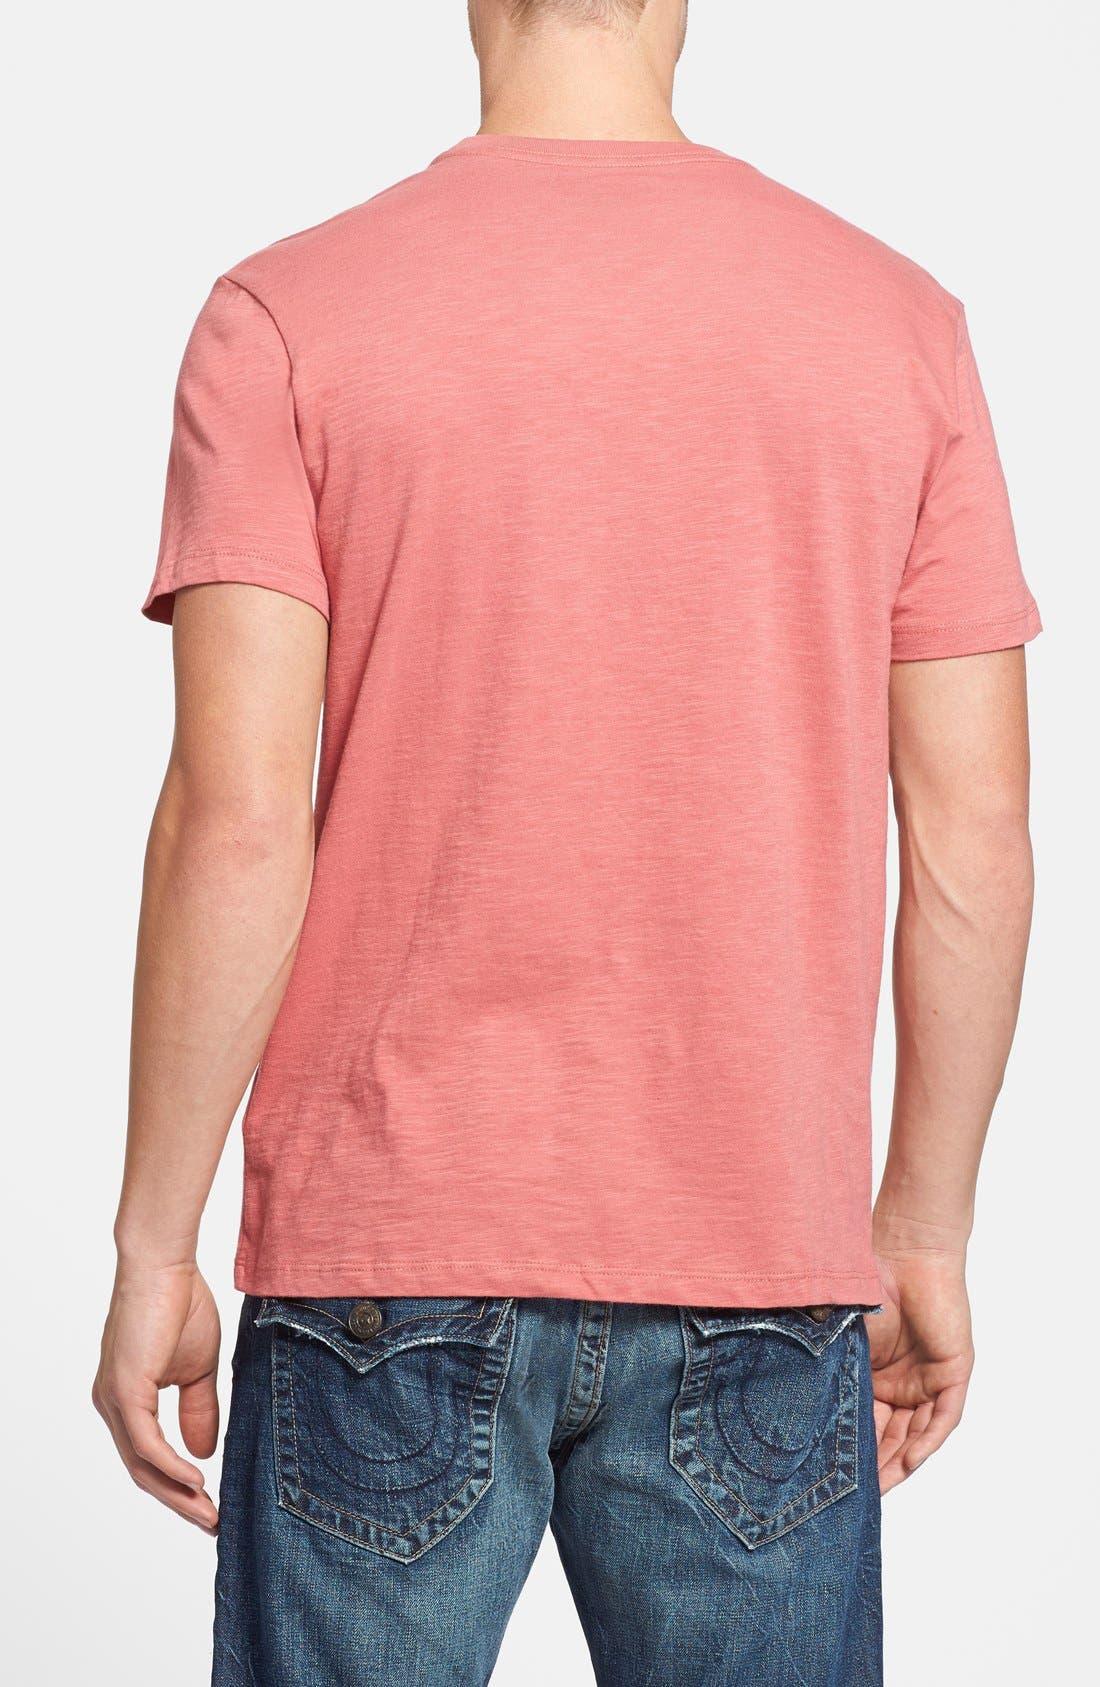 Alternate Image 2  - True Religion Brand Jeans 'Stark' Graphic T-Shirt